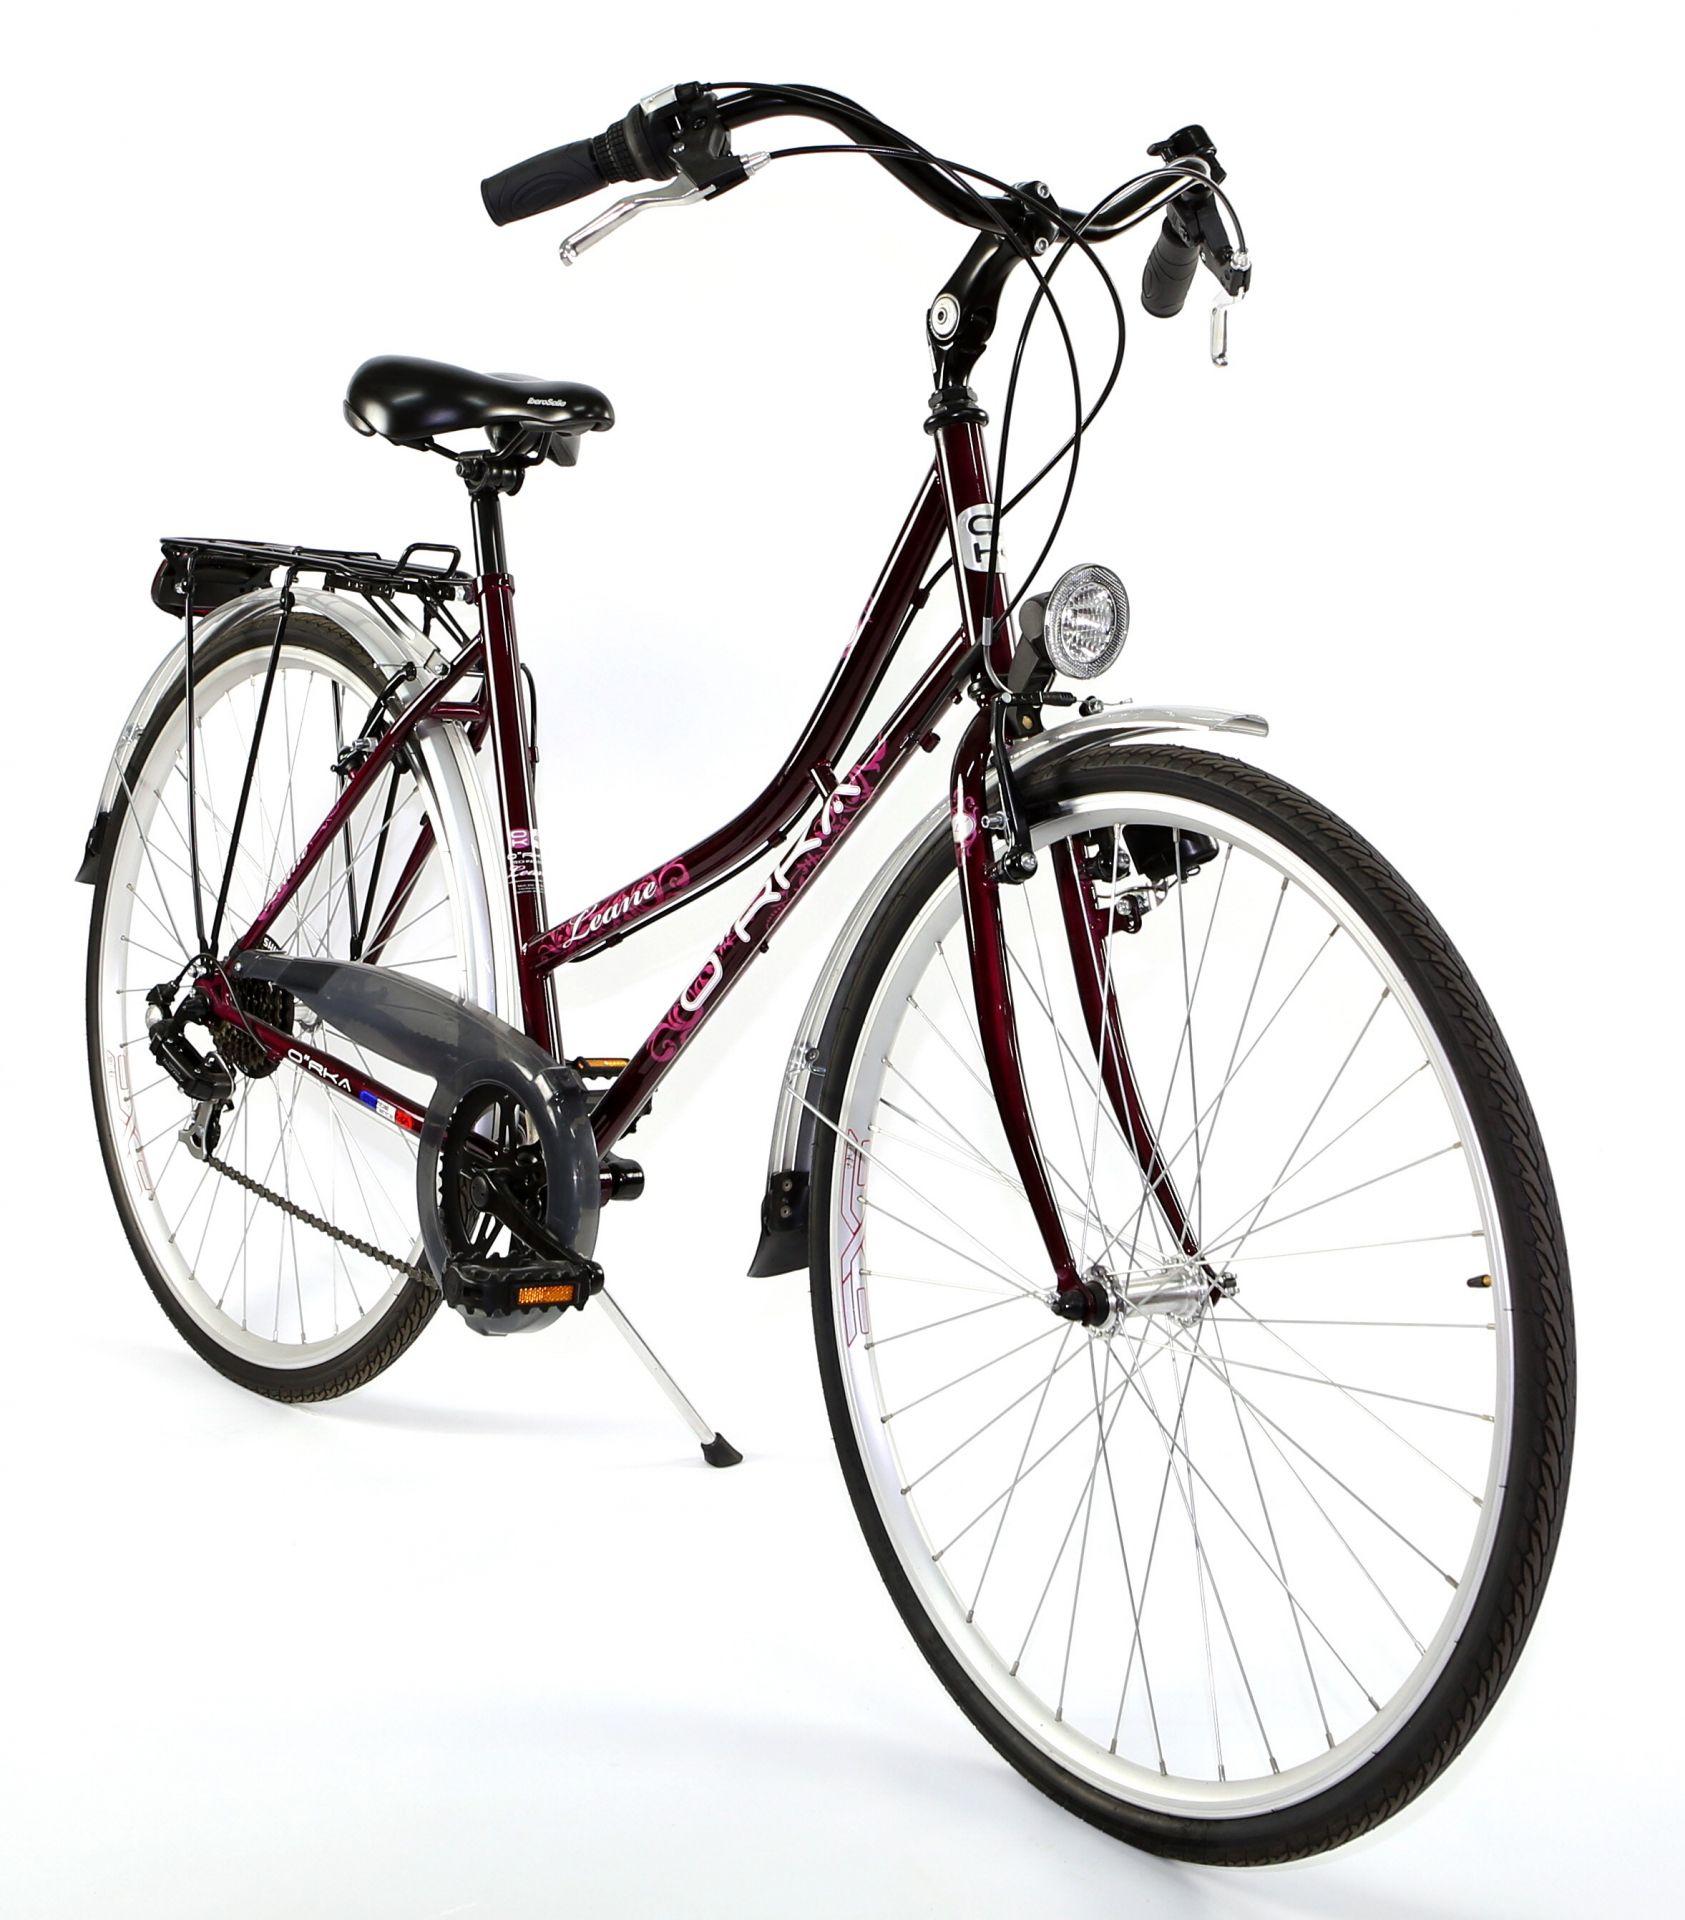 Vélo ville rétro Orka Léane - XS